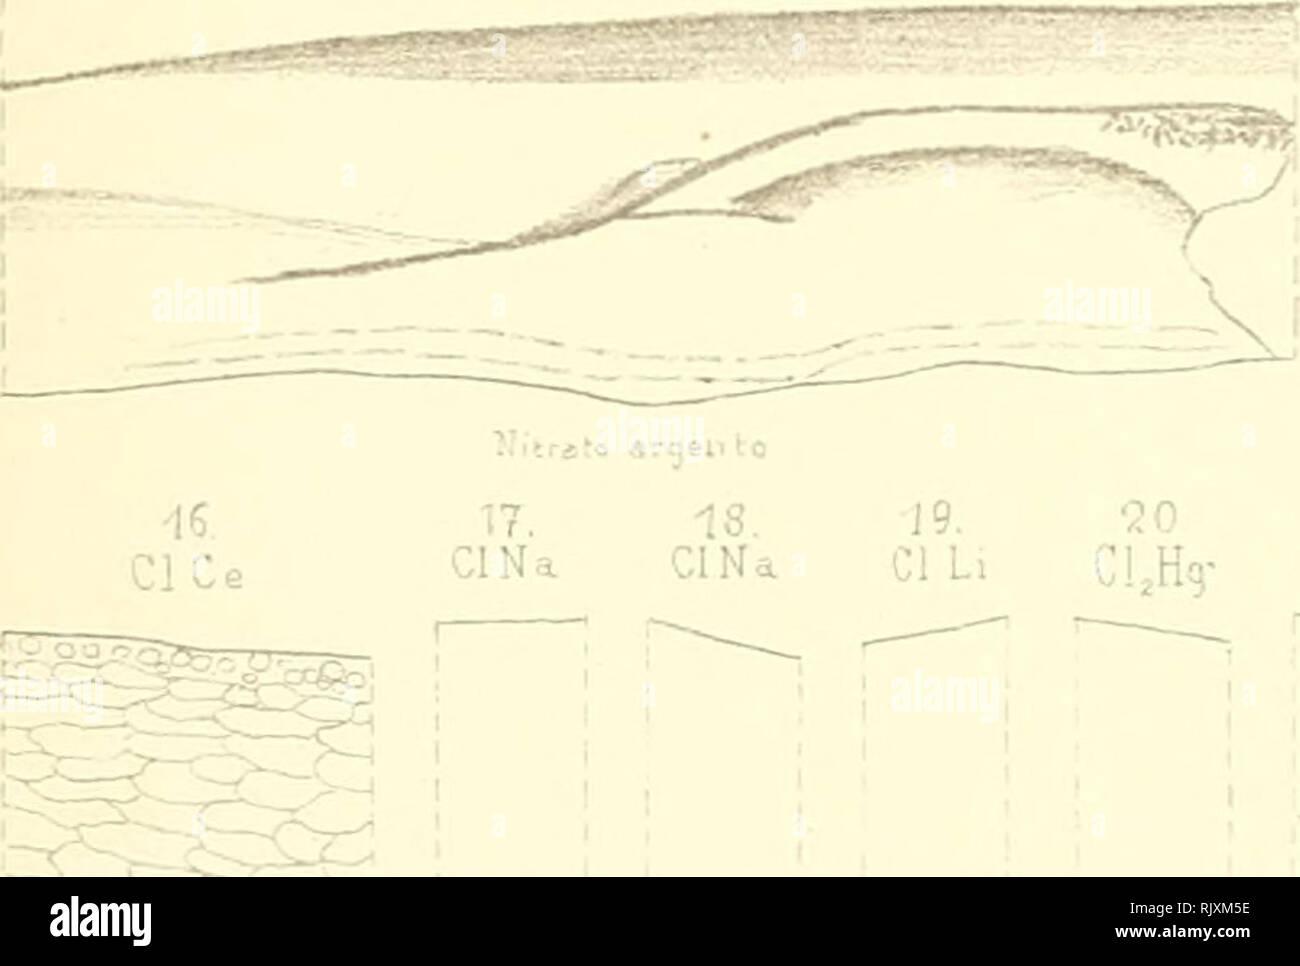 ". Atti. -- Les plantes Les plantes; Italie; Cryptogamia; Mycologie. Arti cl(>ll Isl? Univ. Rorcinko Povi di.le volu.XI Tav.lX 12. 3. 4- 5 6 7. 8. 9. 10. Vò 14. 15. Cy.FeK C^.Fei; Cy.FeK, Cy.FeK, Cl^Hg Cl,Hg K EC EC EC EC EC EC K, CU.,... ClNa ClNa 'Â"" ° ^ %? ^ ^xV$s PMNO;/ 'â PMNO,), j'ai/uo'uuit' o.iru ""g^un *Â""Â""oS -etrii'. ;^ rj nm, -â"" ^=, AgNO, AqNO. 19. ¢JO 21 CIL, C!,H9- CLHg .i.Â""'j A,jNC, 12. AqNO,:1K 25. 27 de la CIK. AoMO. g""""} AgNO, AqNO, 26. Aqh A,-HO, 30. AgNOj AqNO, 23. V '''tór' L.Buscalioni del. Tacctiinardi jLperrarì.lil.Pavii. Buscalionie Purgotti-Dissoc deijoni.e.diffus.. P Banque D'Images"